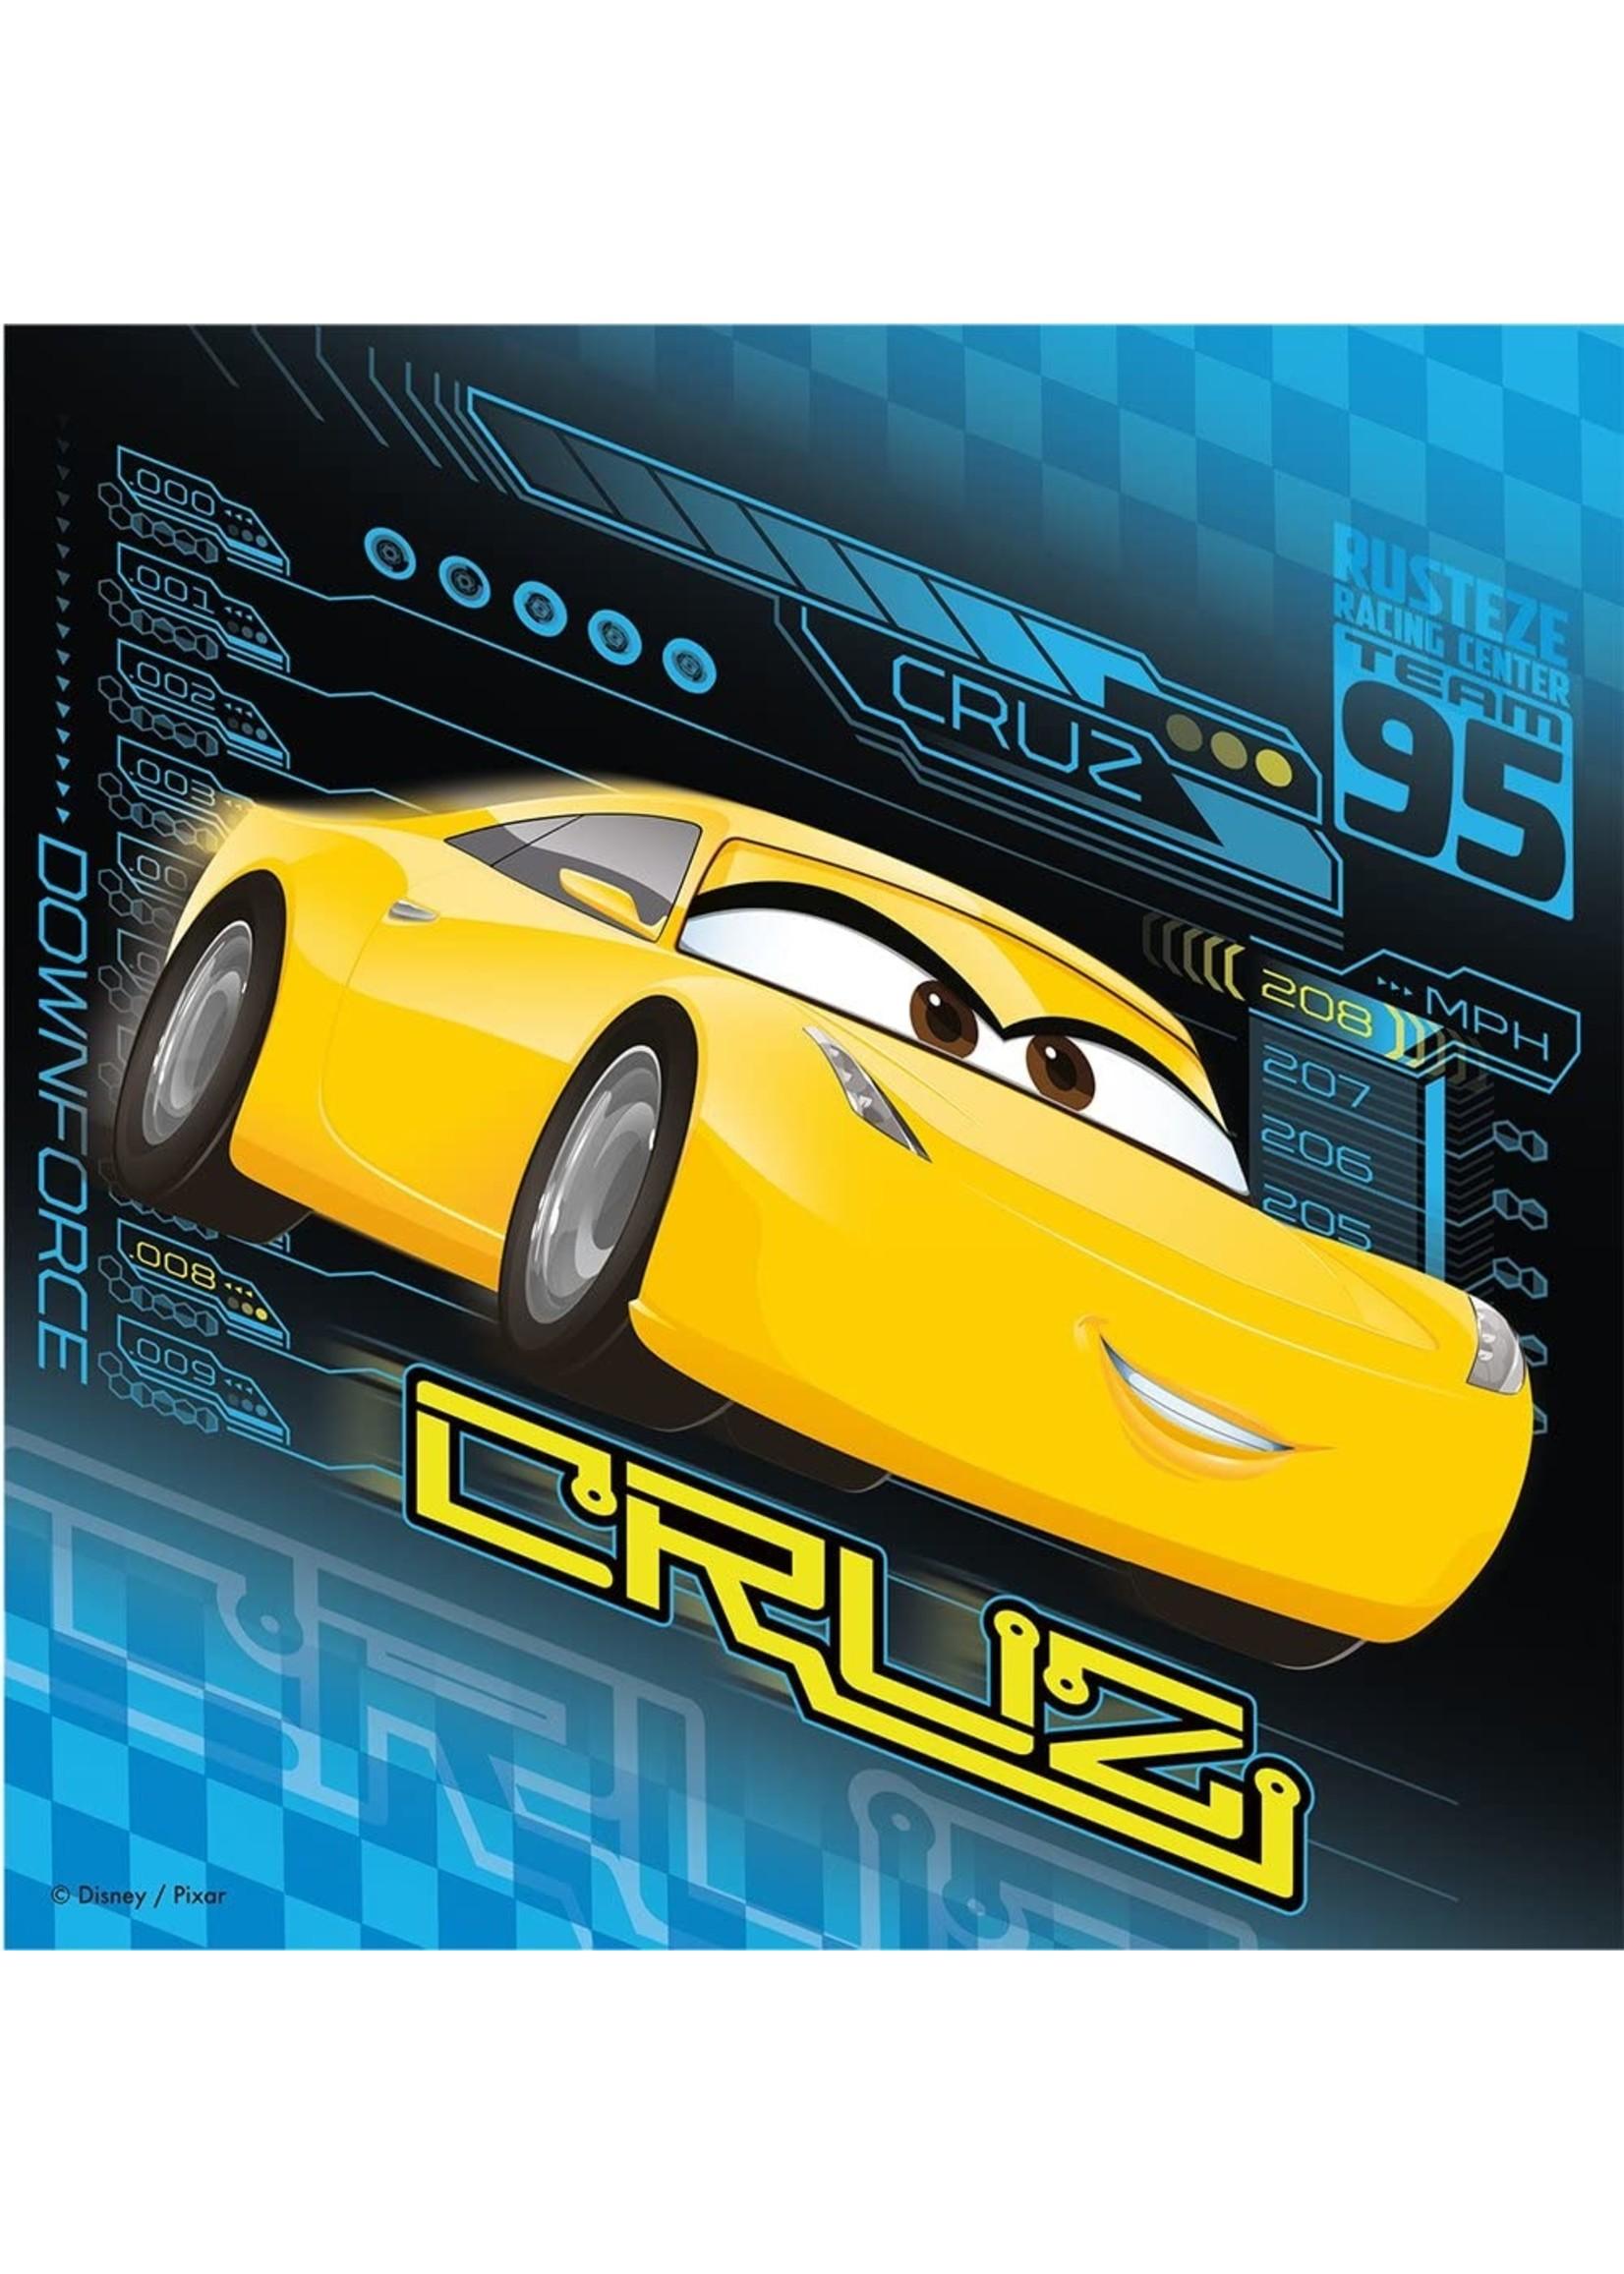 Puzzle: Cars 3 (3 x 49 pc)